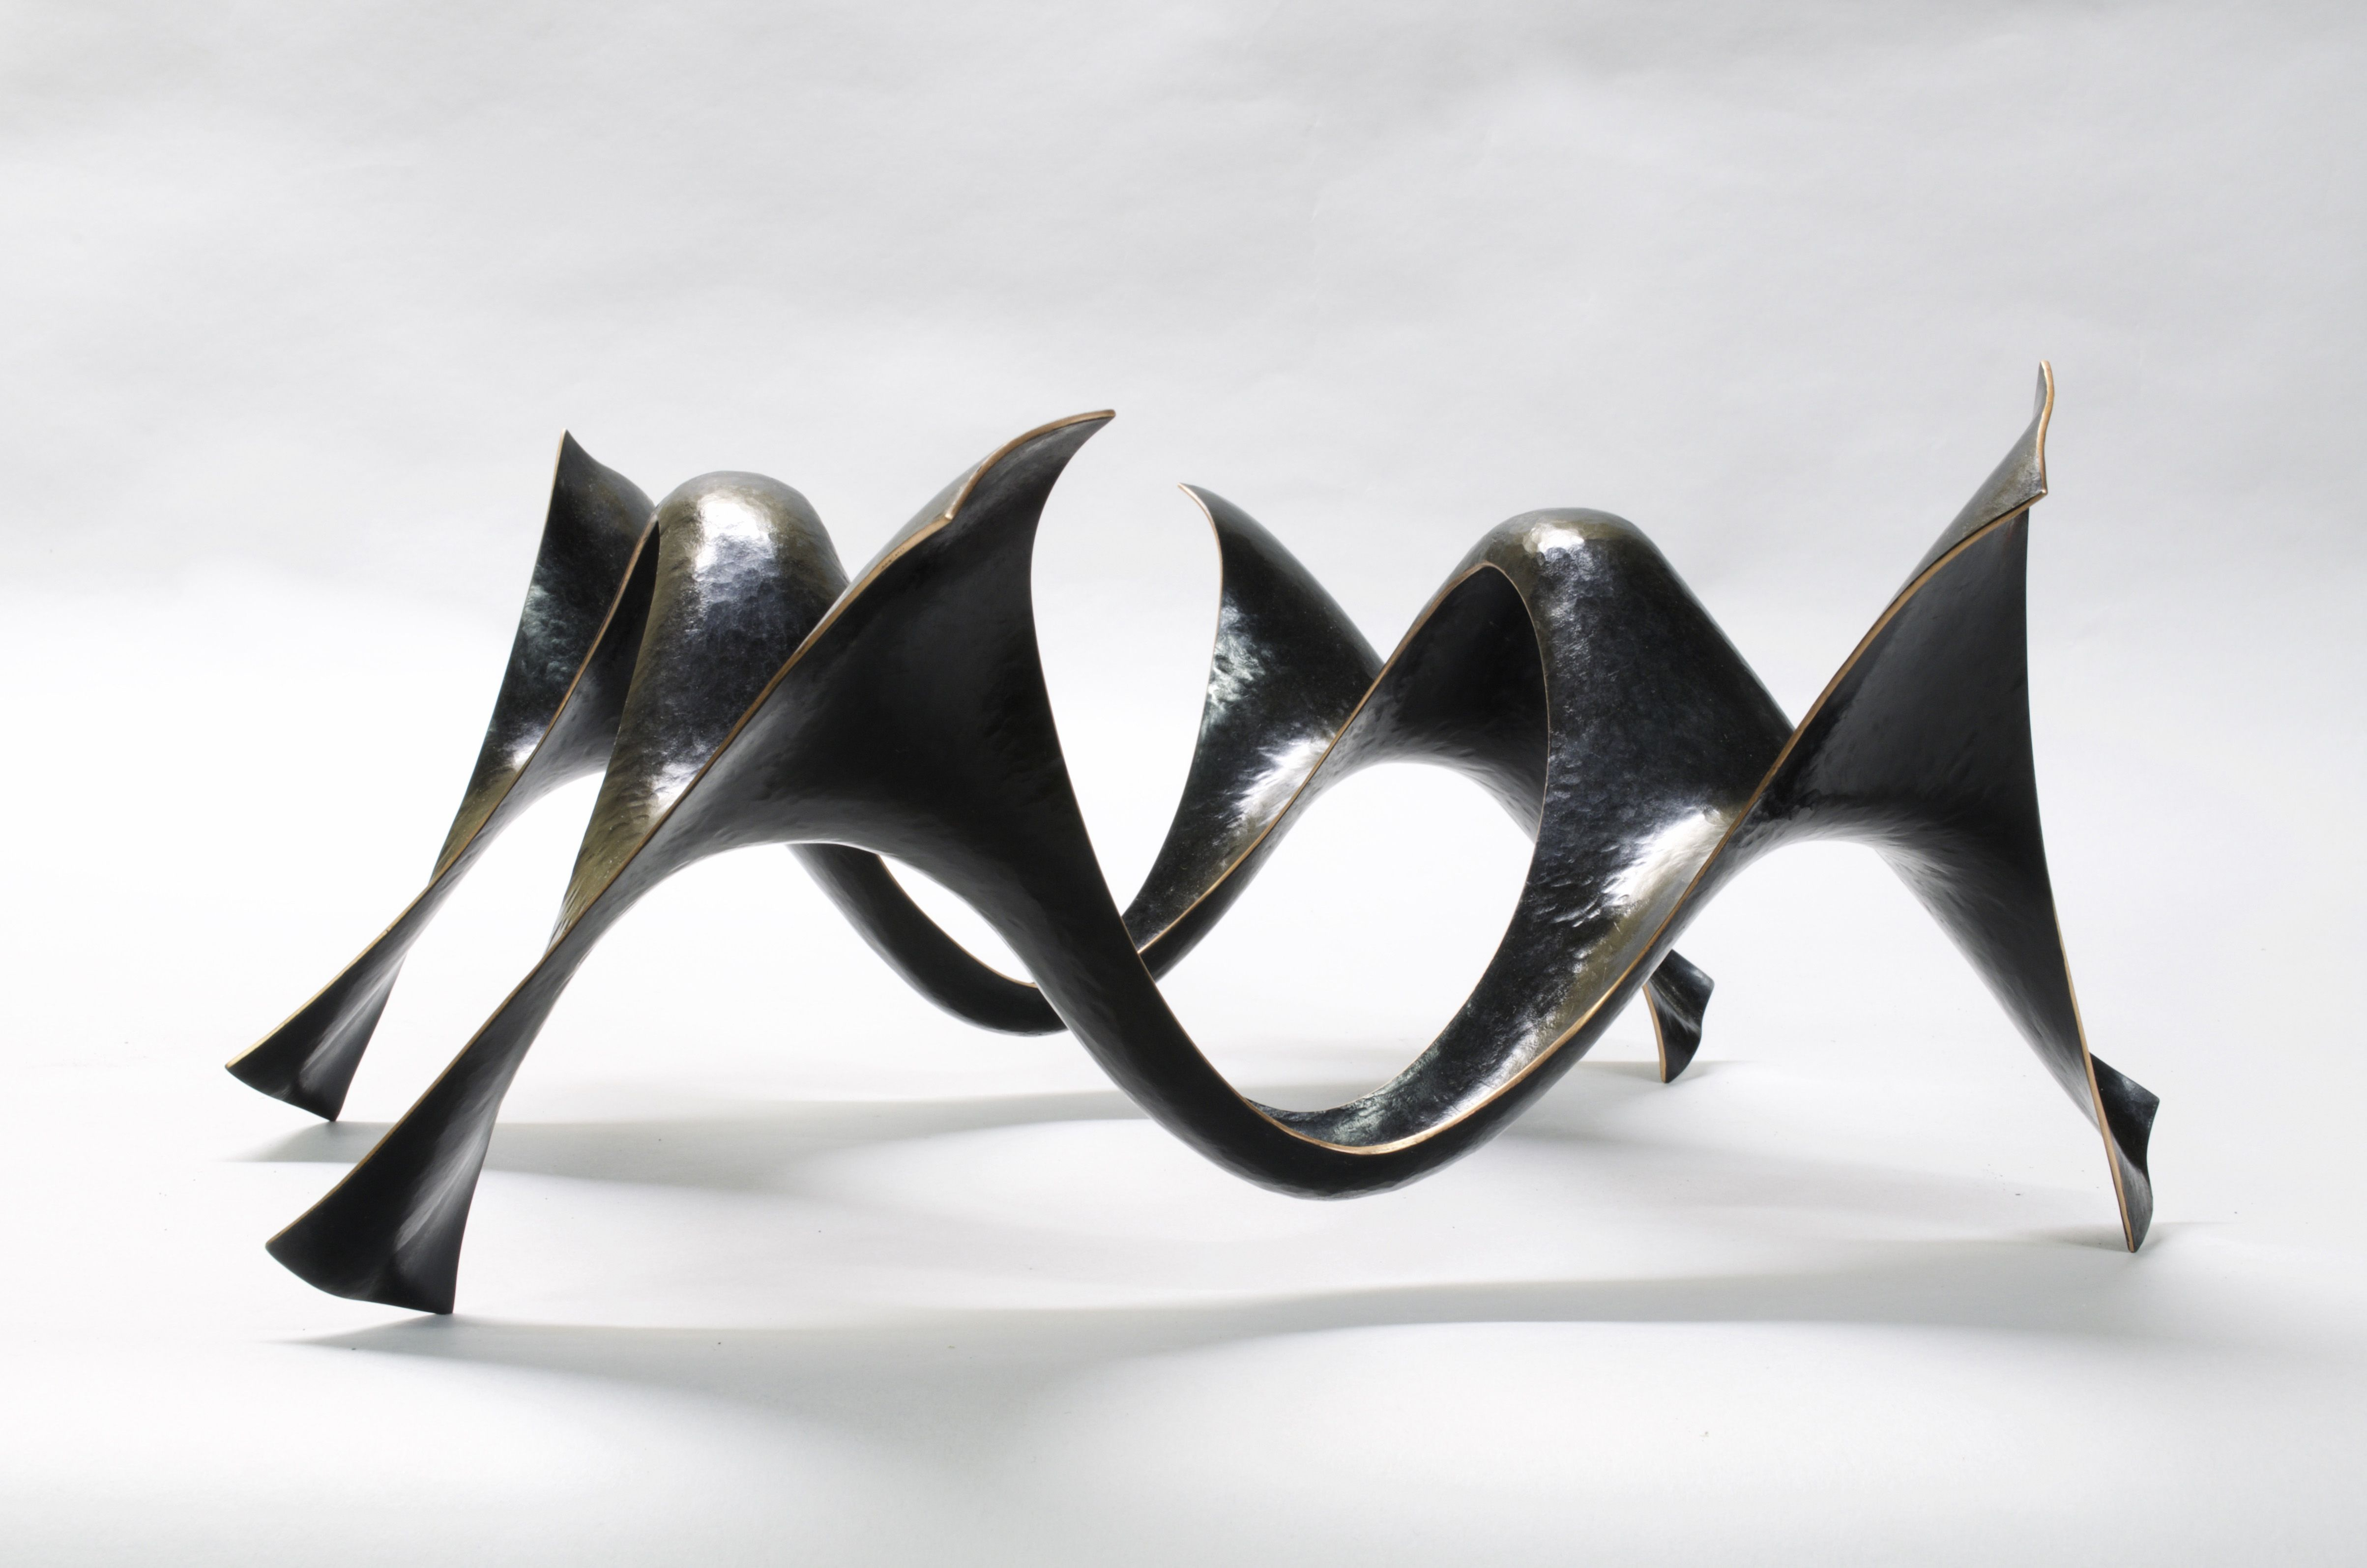 La Houle, sinusoïdes en suspension. Cuivre martelé et patiné par Ulysse Lacoste © DR #SalonRevelations #metiersdart #finecraft #madeinfrance #handcrafted #handmade #faitmain #contemporaryartist #sculpture #metalart #metallic #metal #metalwork #metalsculpture #metalsculpture